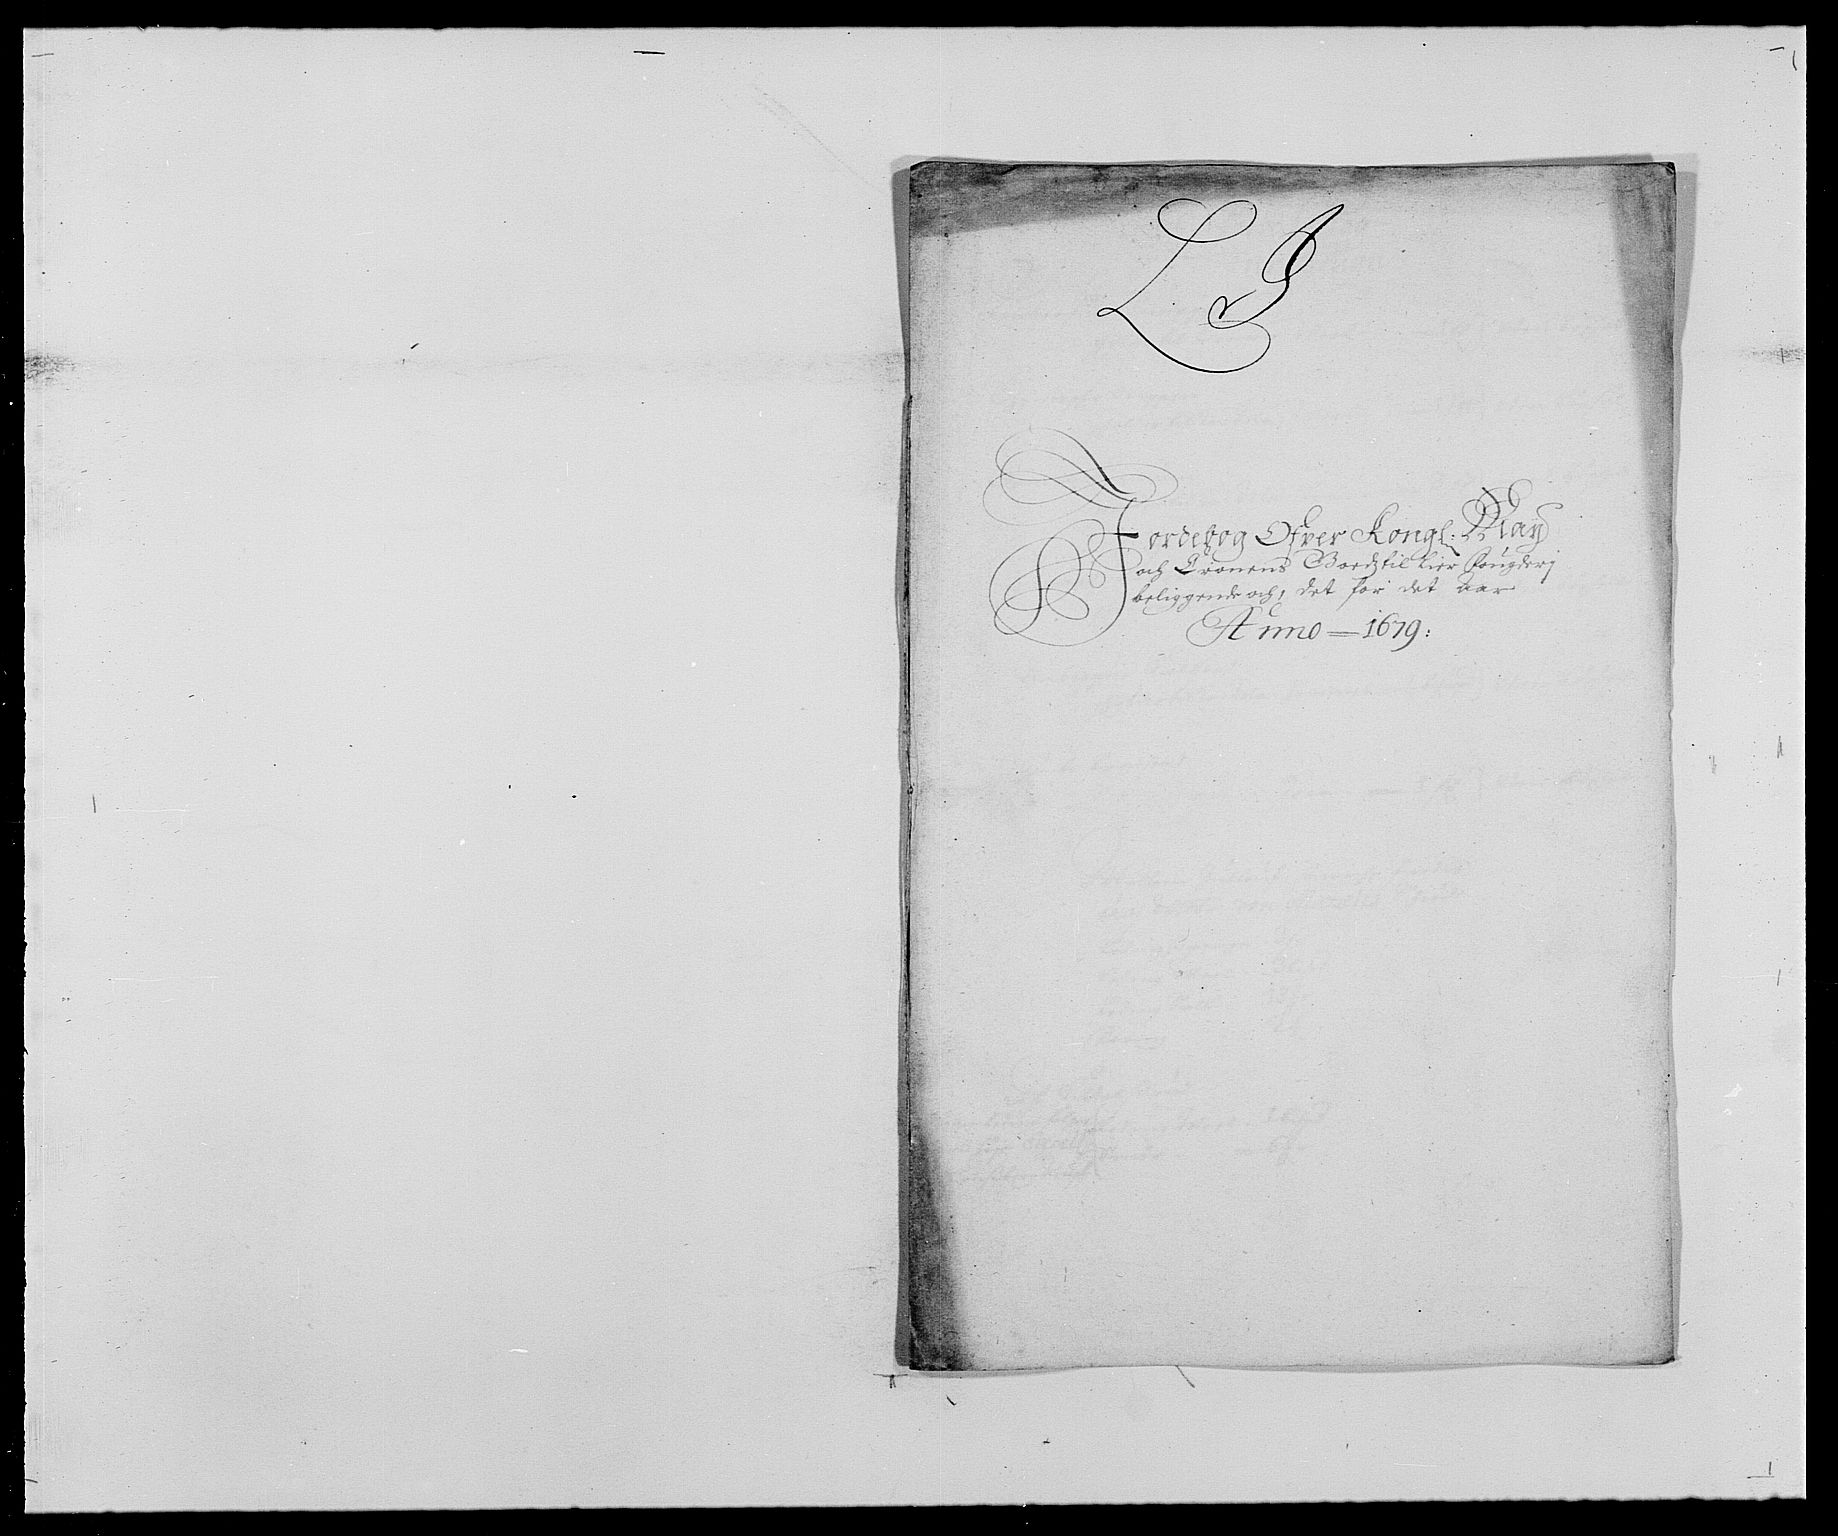 RA, Rentekammeret inntil 1814, Reviderte regnskaper, Fogderegnskap, R27/L1686: Fogderegnskap Lier, 1678-1686, s. 138